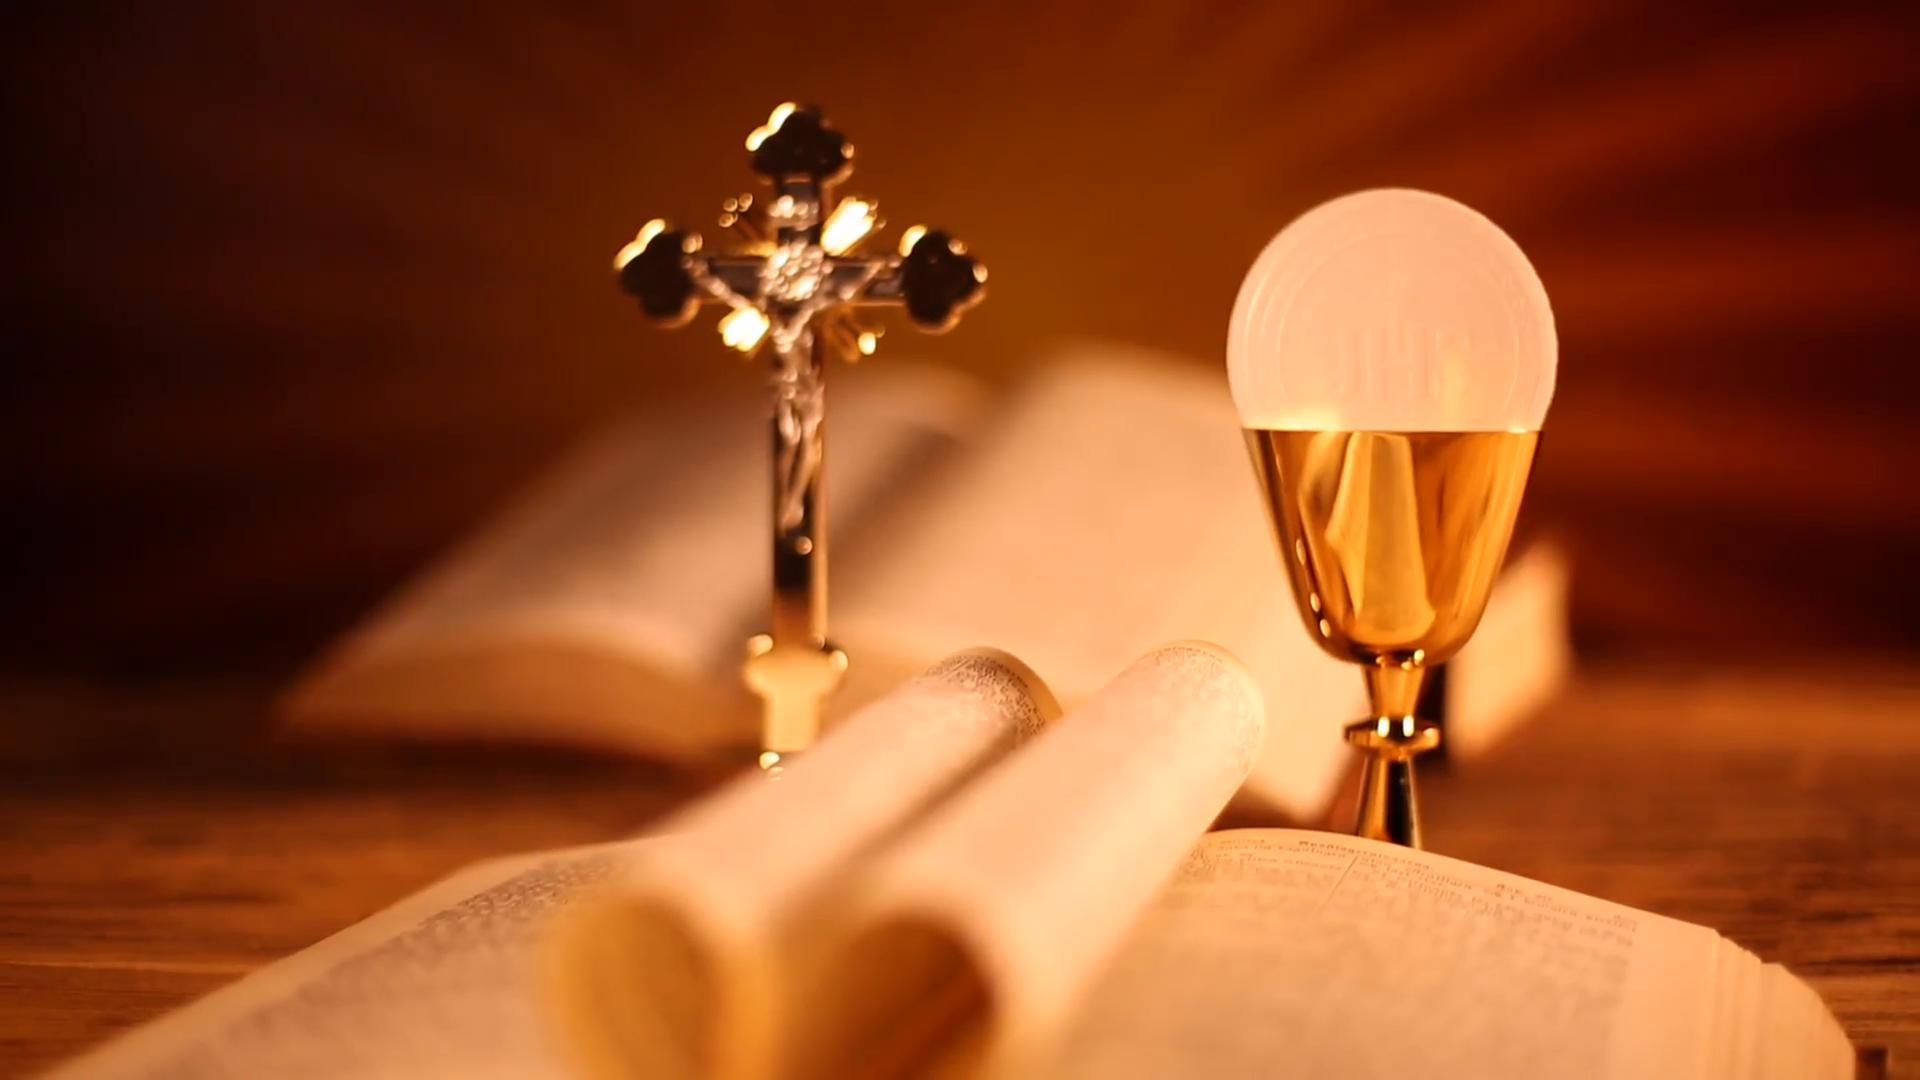 Prayers before Holy Communion